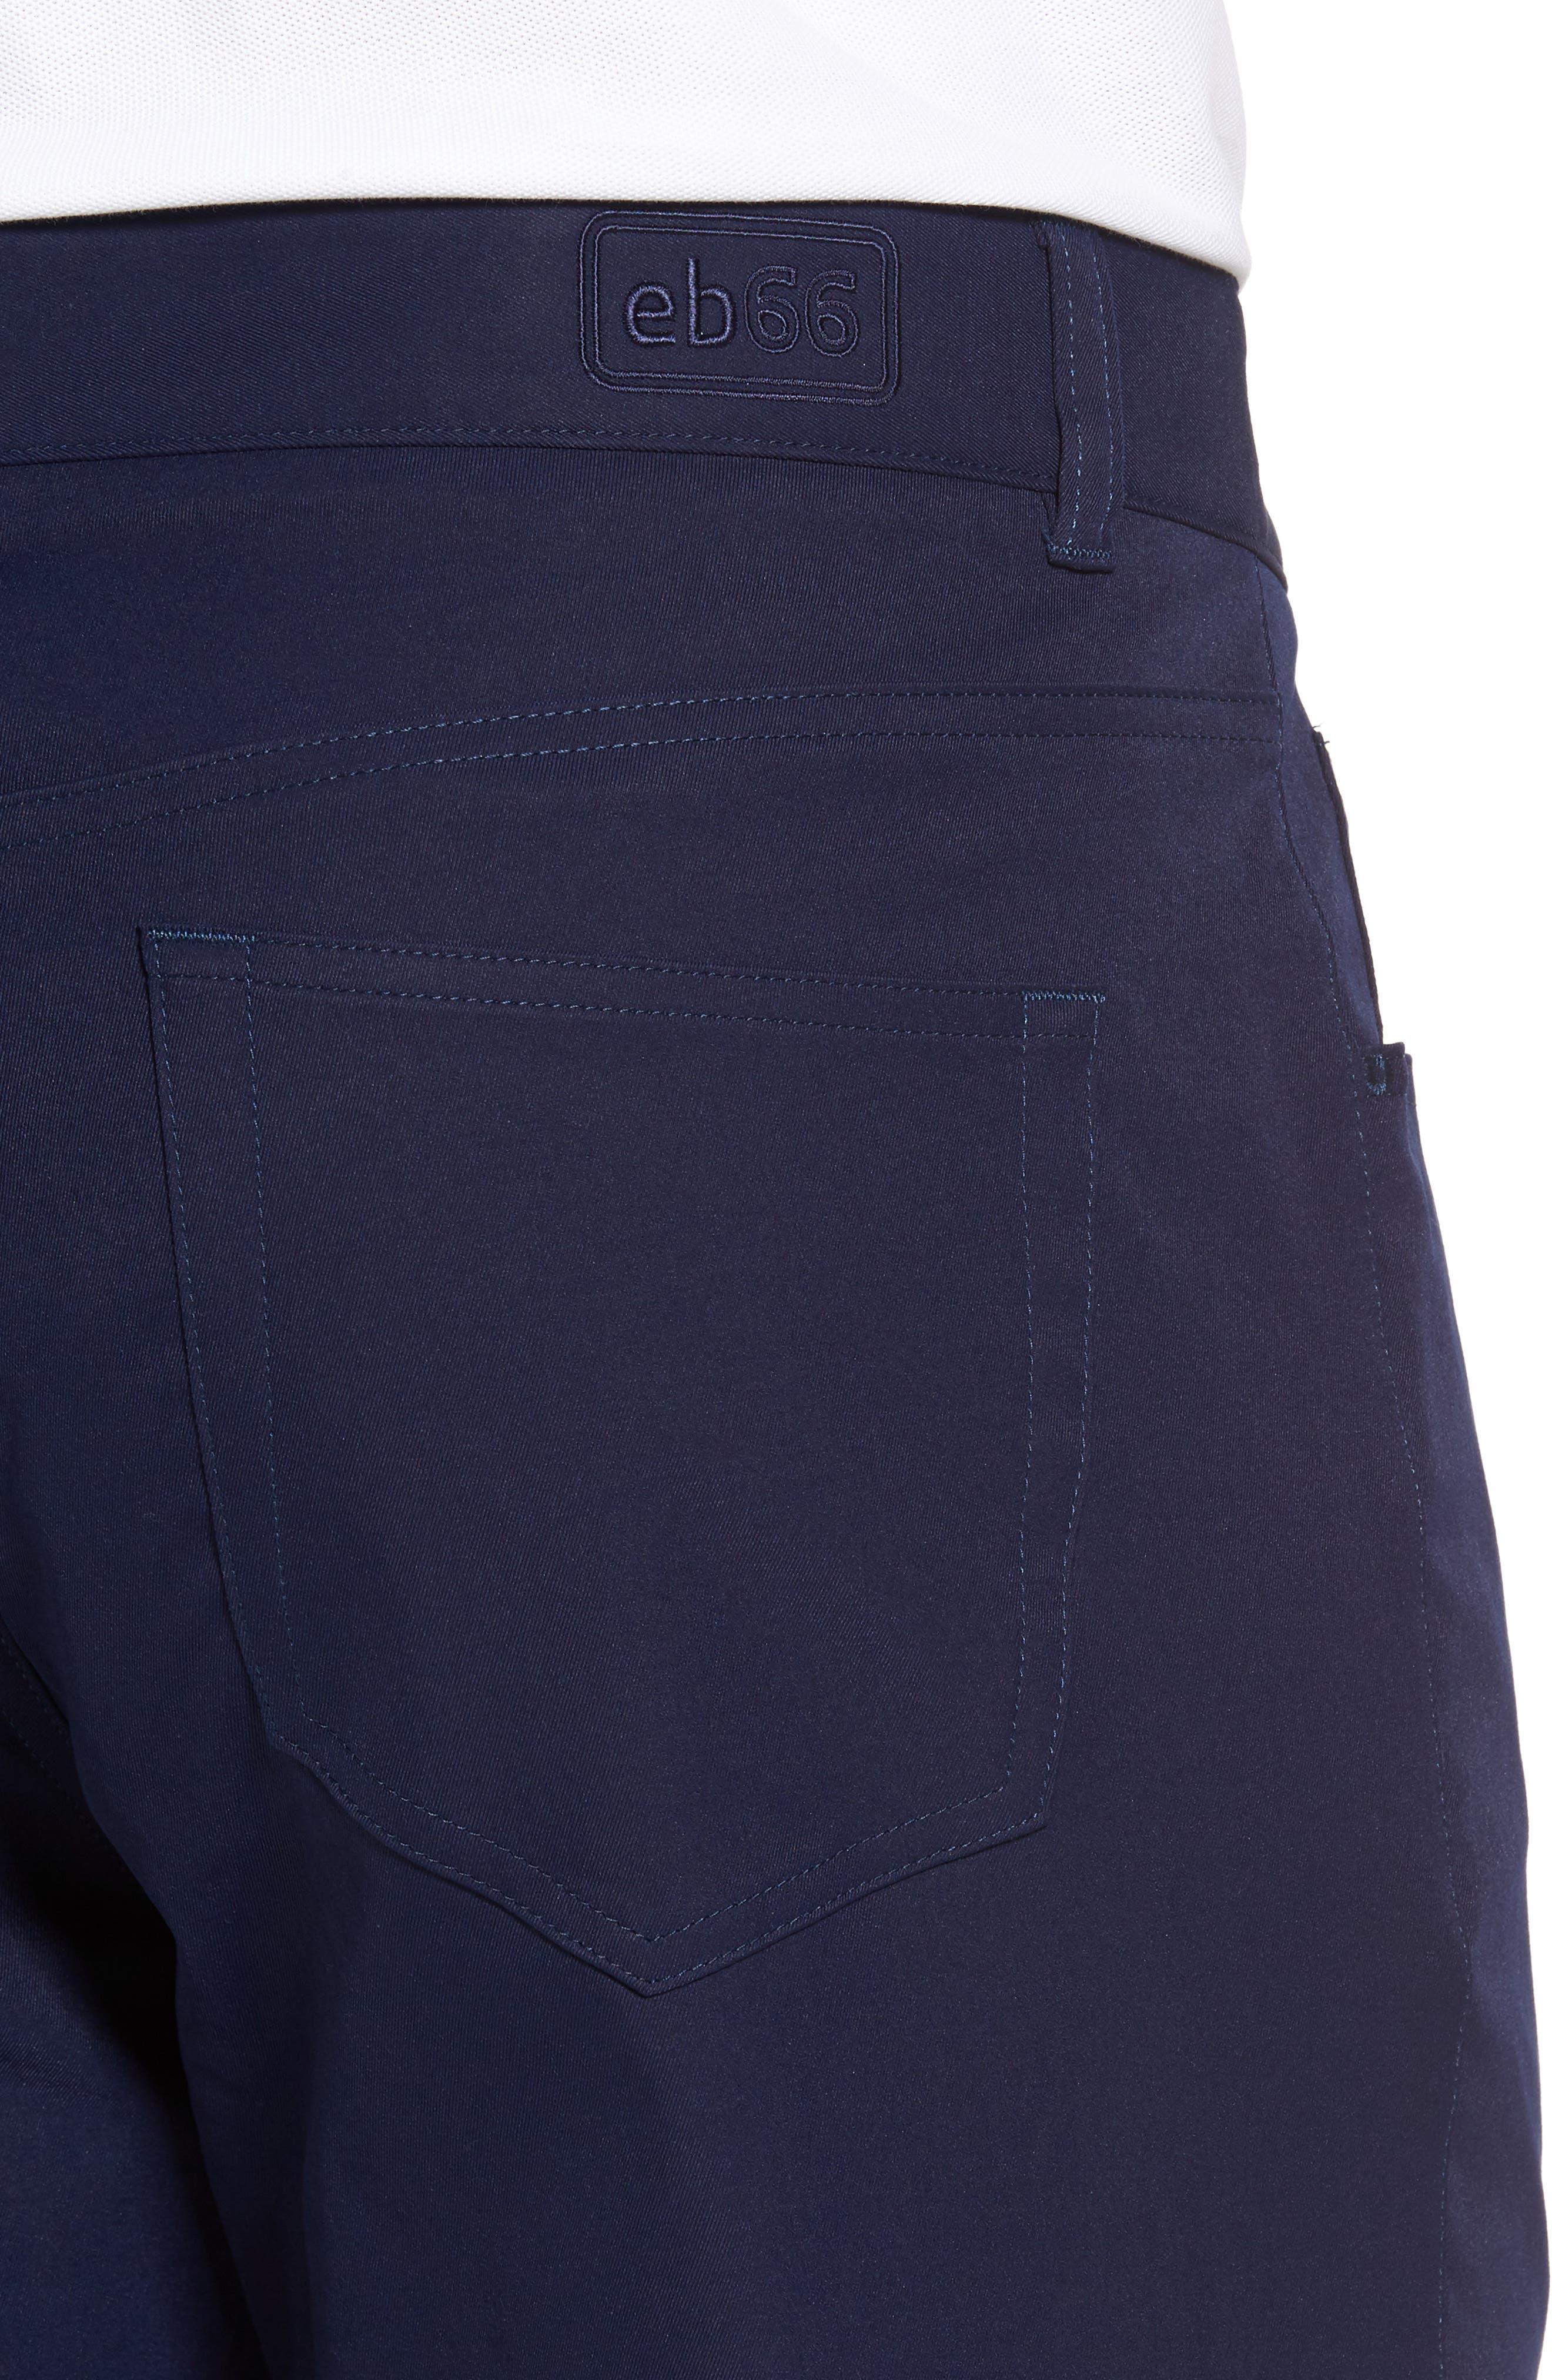 EB66 Performance Six-Pocket Pants,                             Alternate thumbnail 24, color,